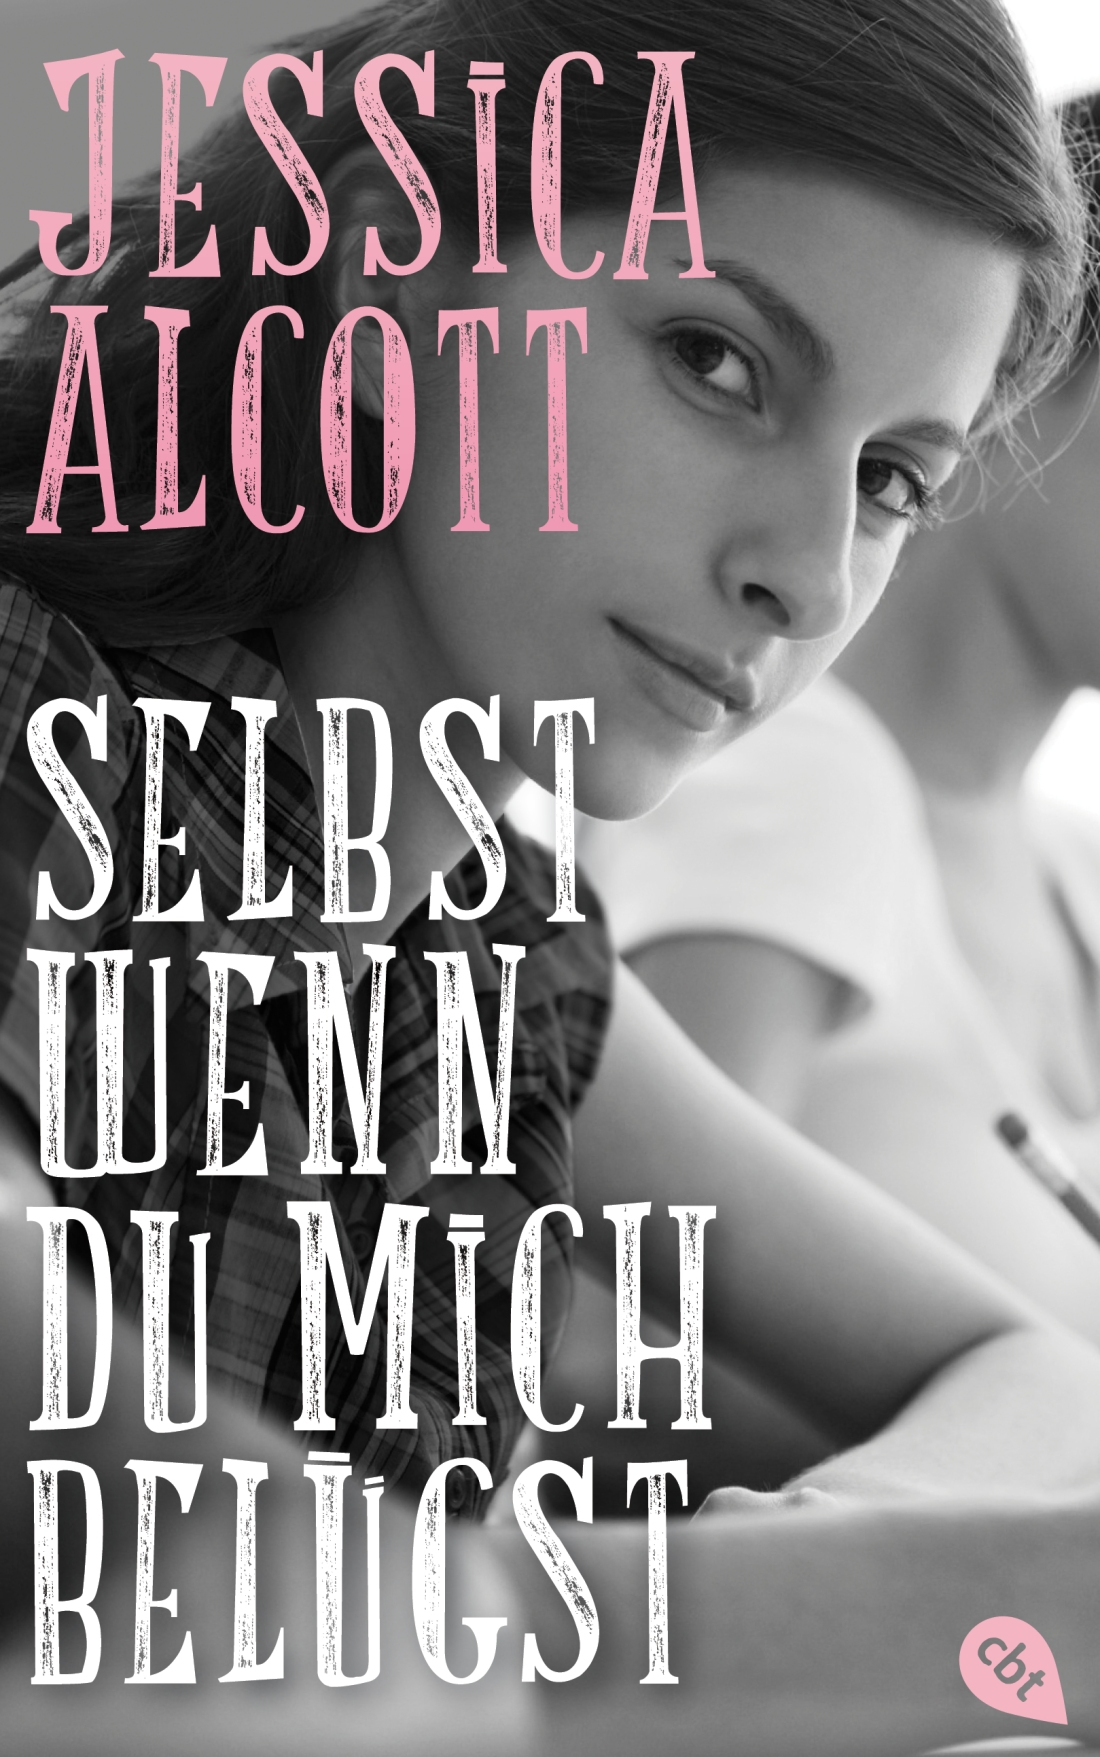 cbt_HC_Alcott_SelbstWenn_U1